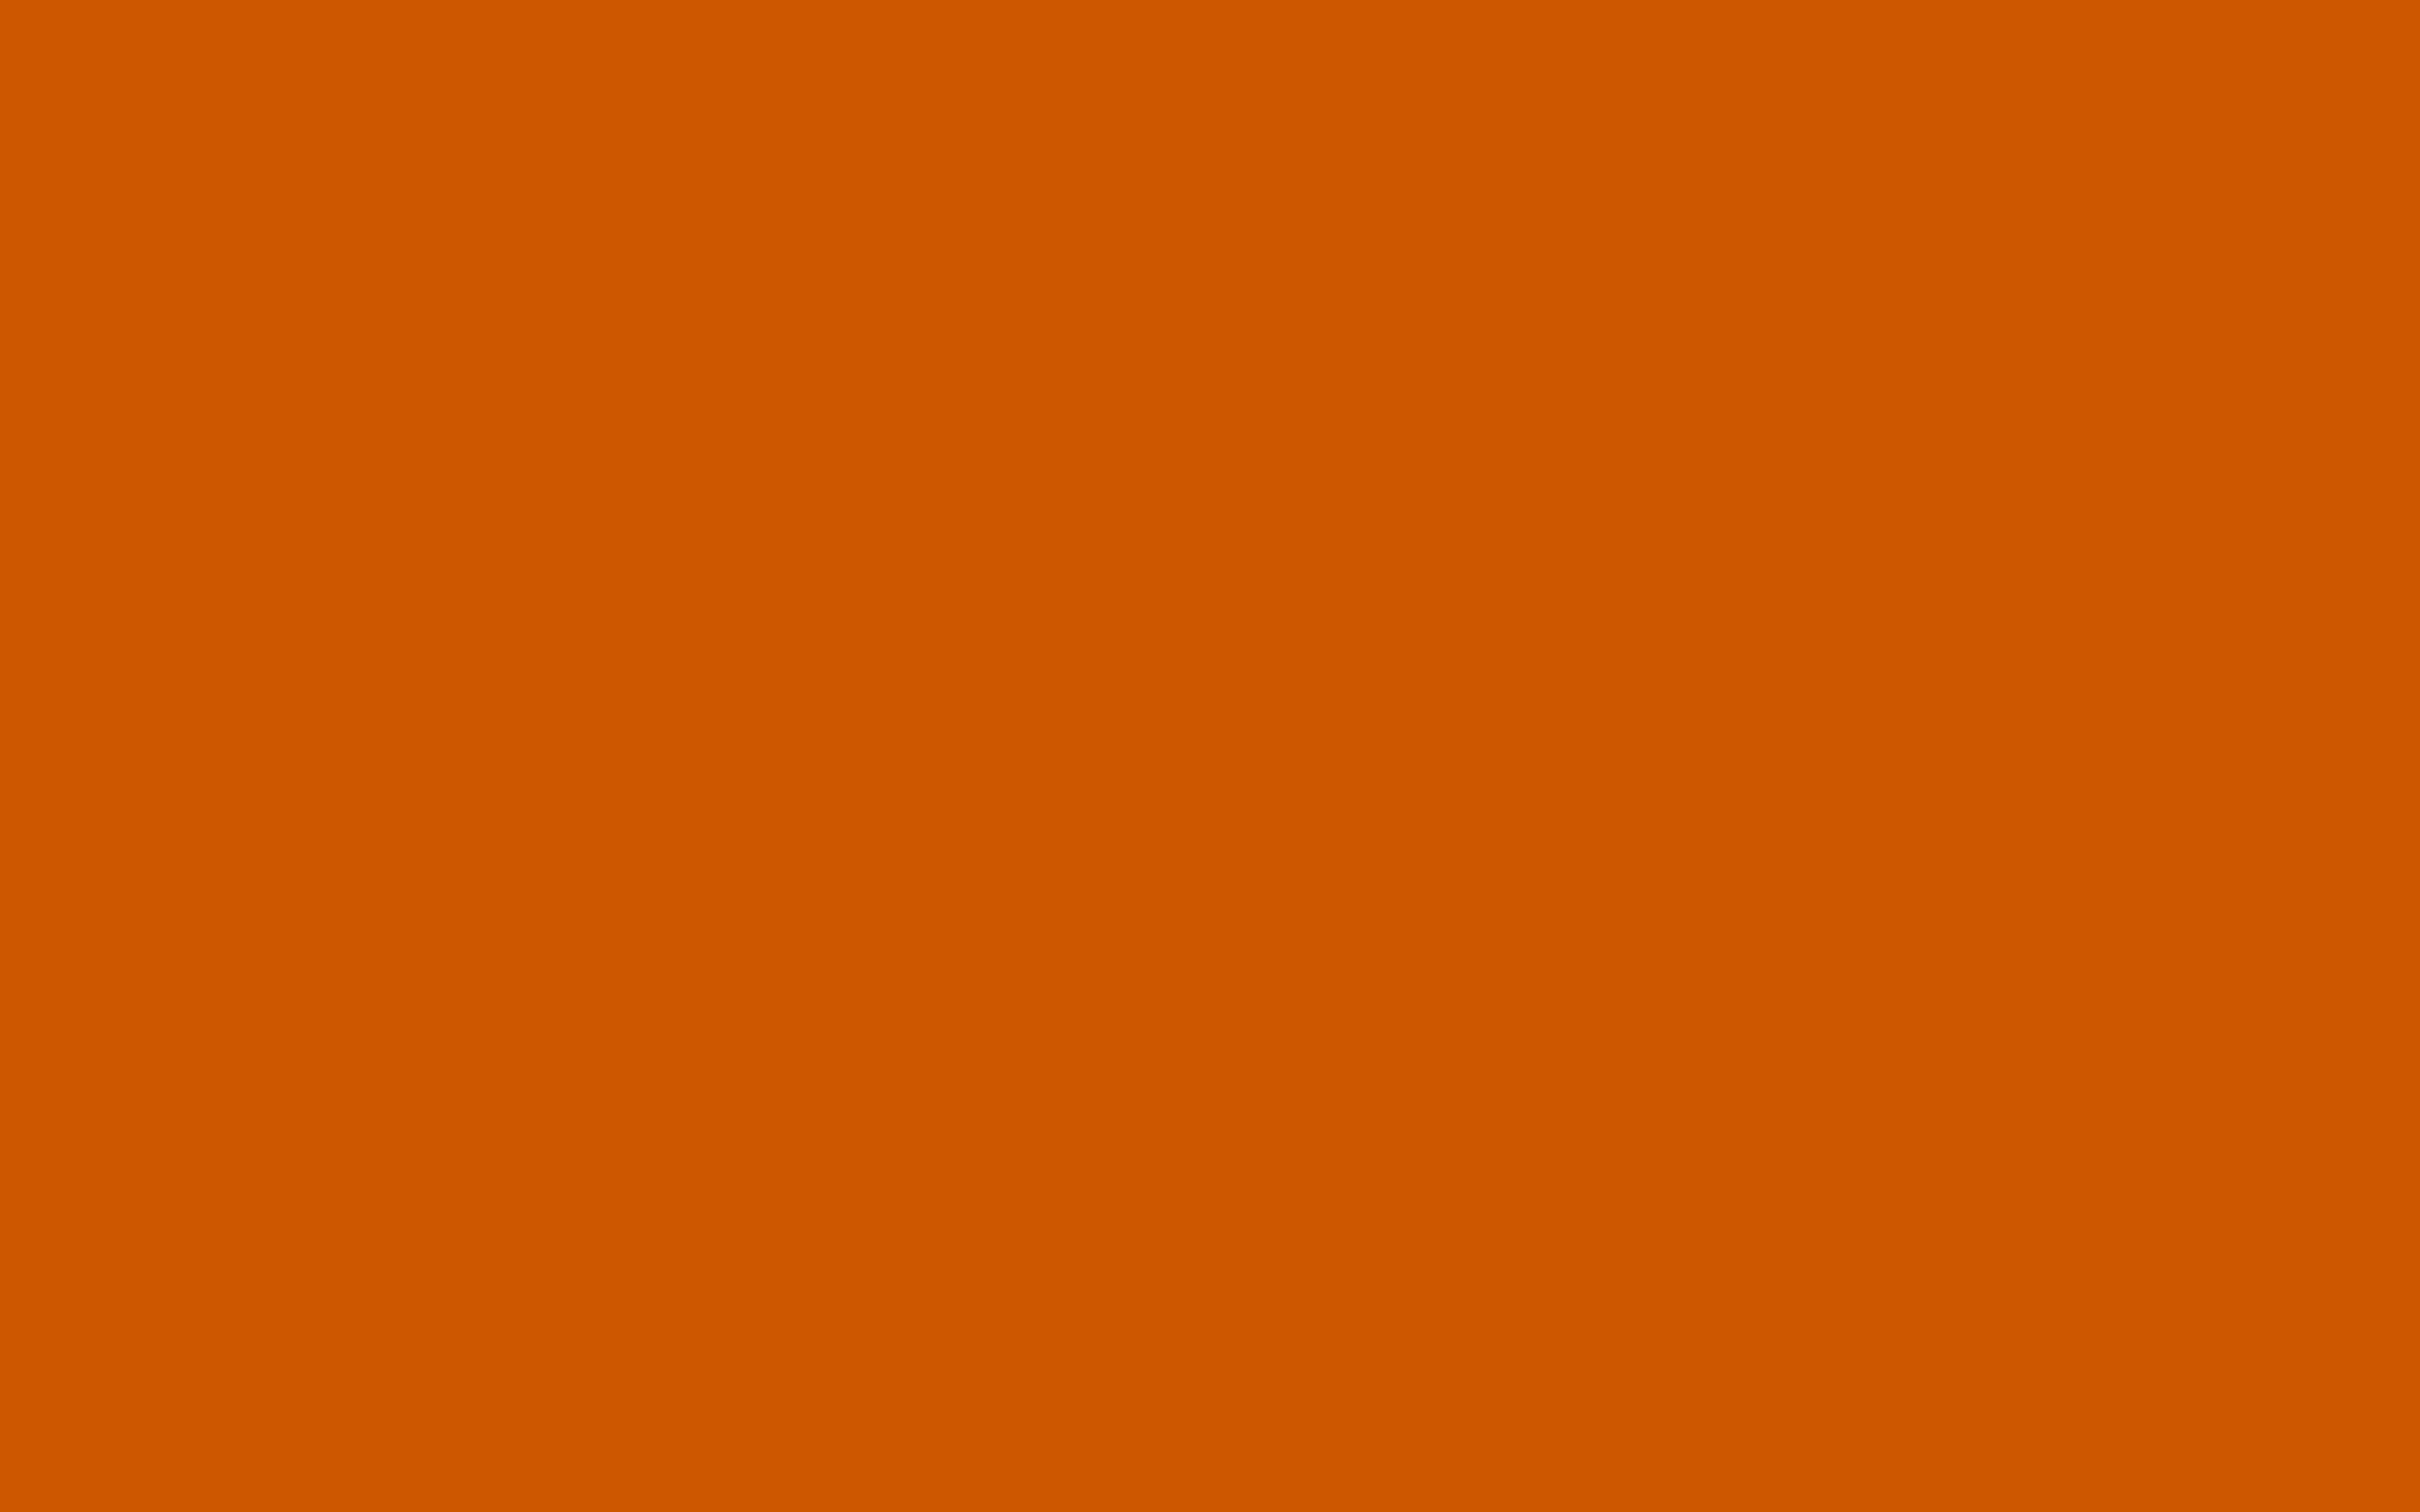 Solid Orange photo